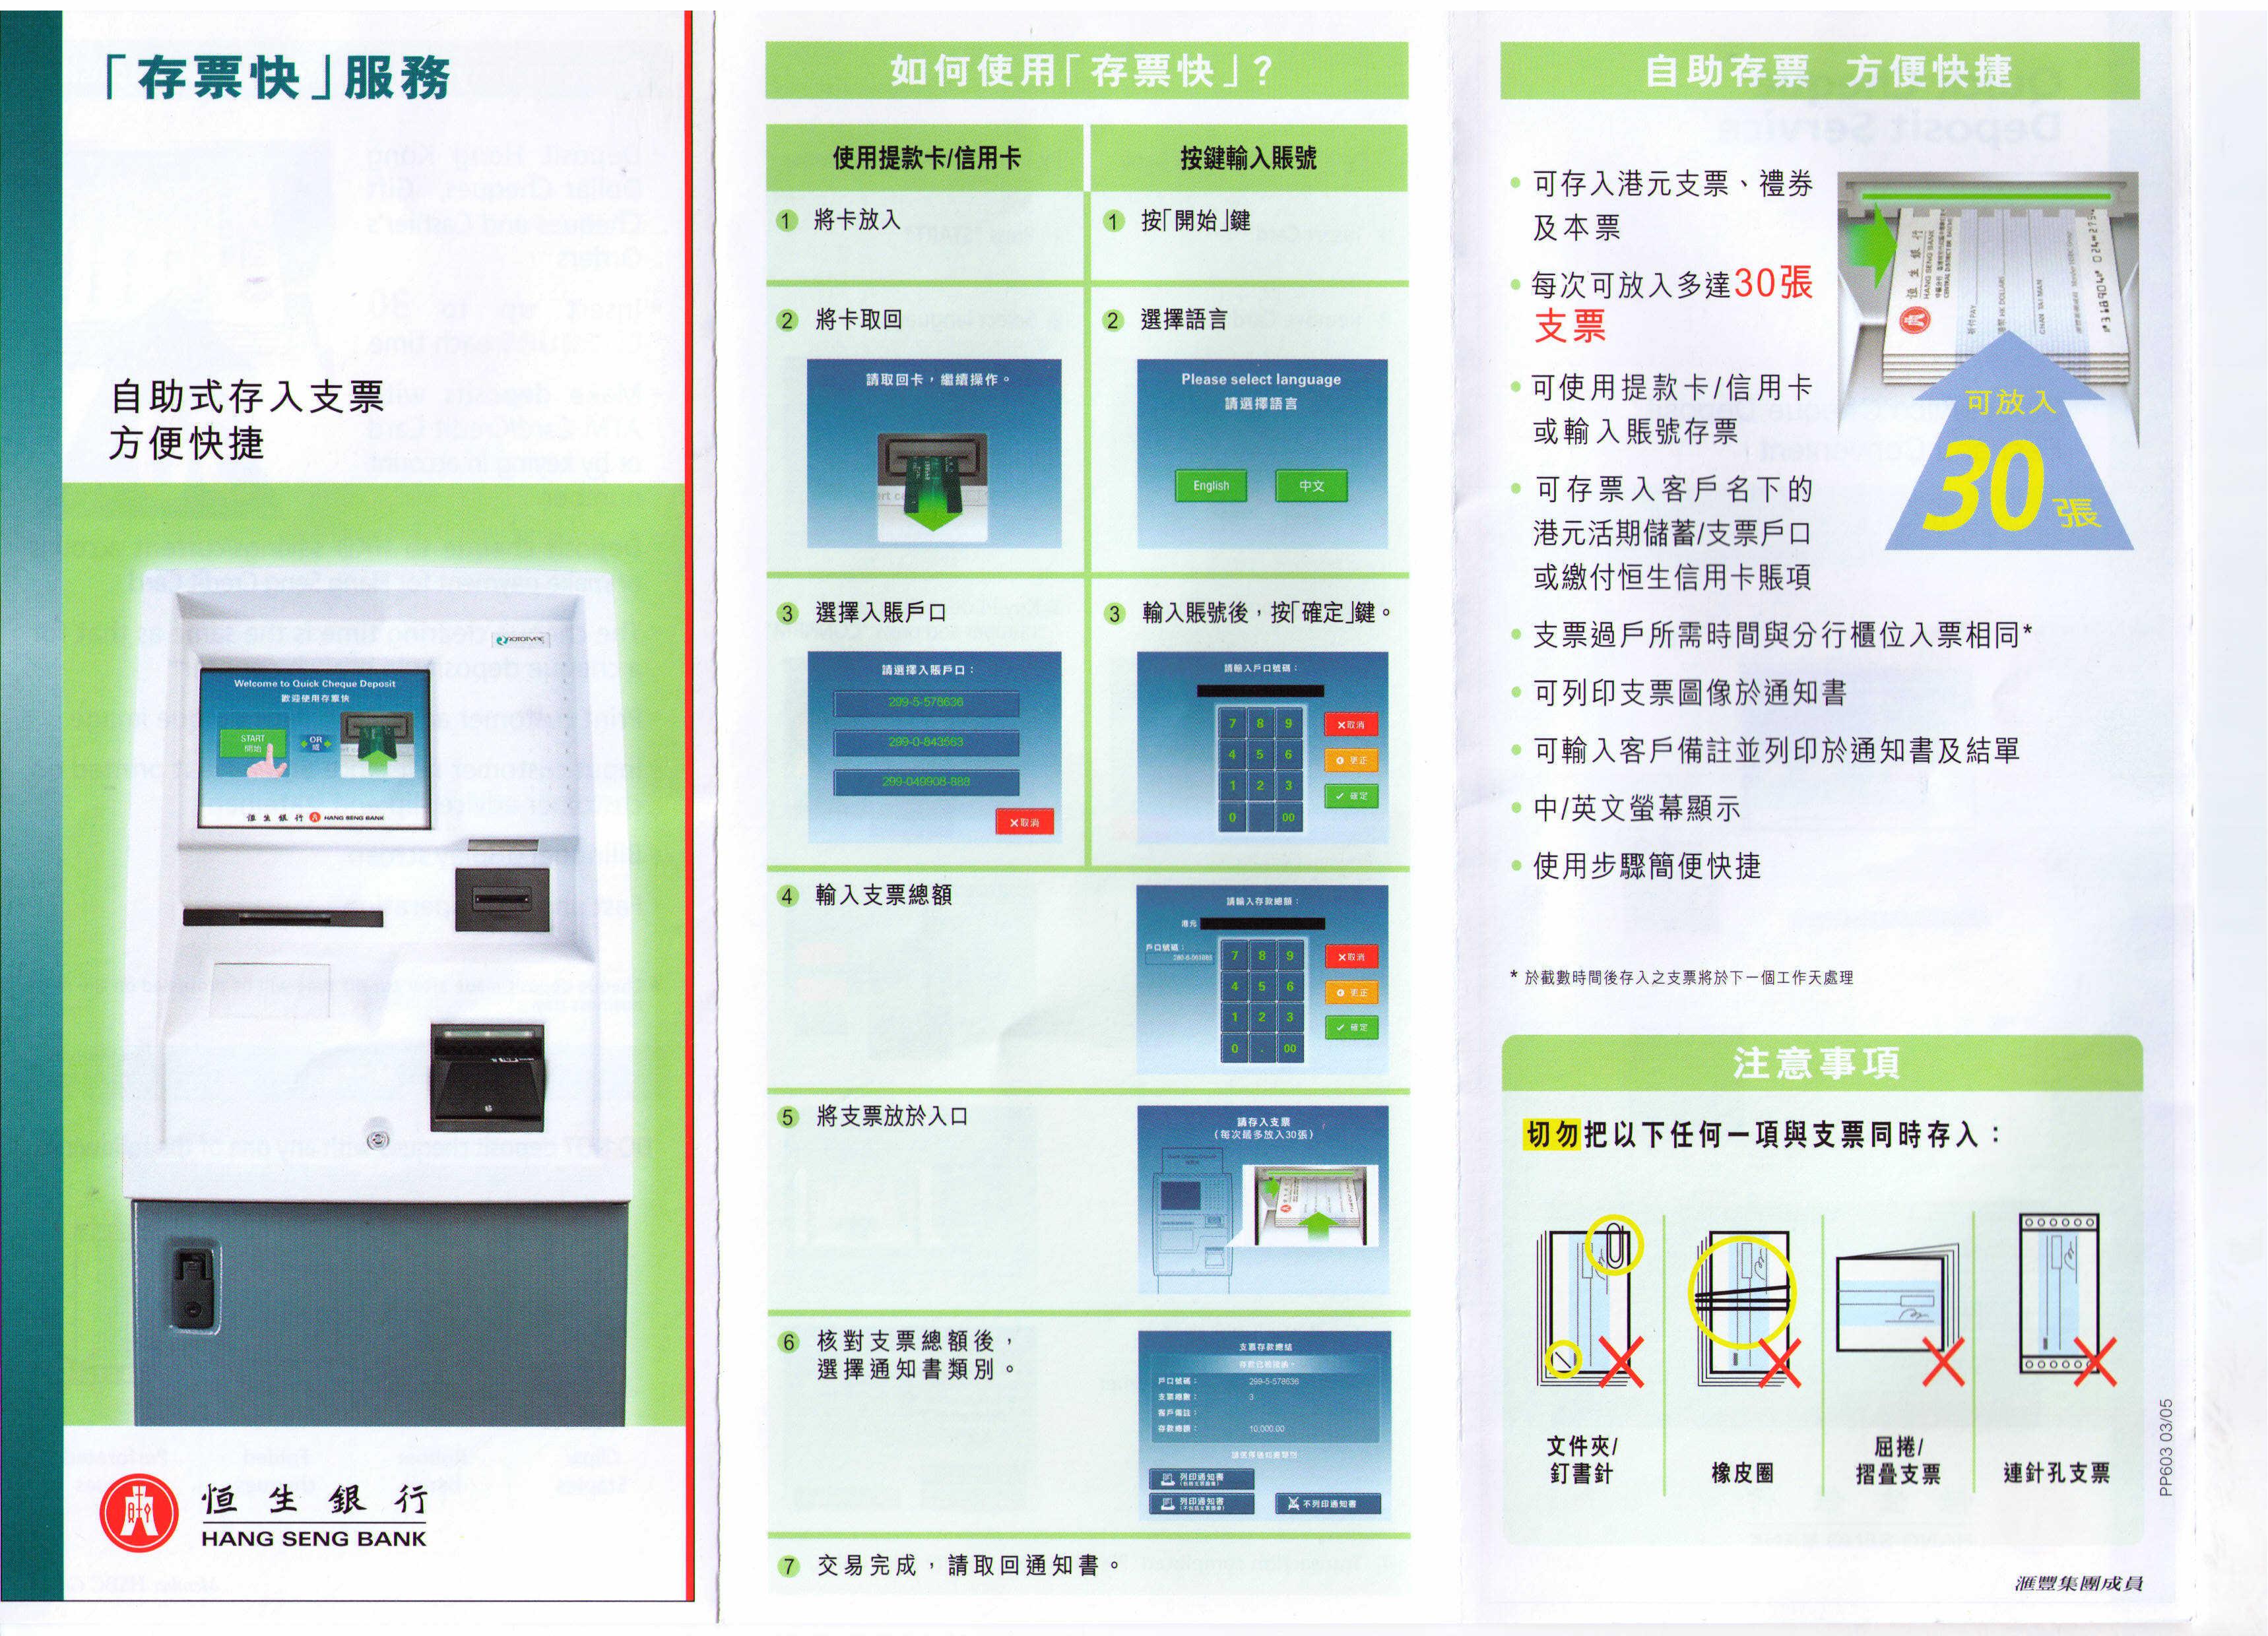 New Page 1 [www.rosa.com.hk]